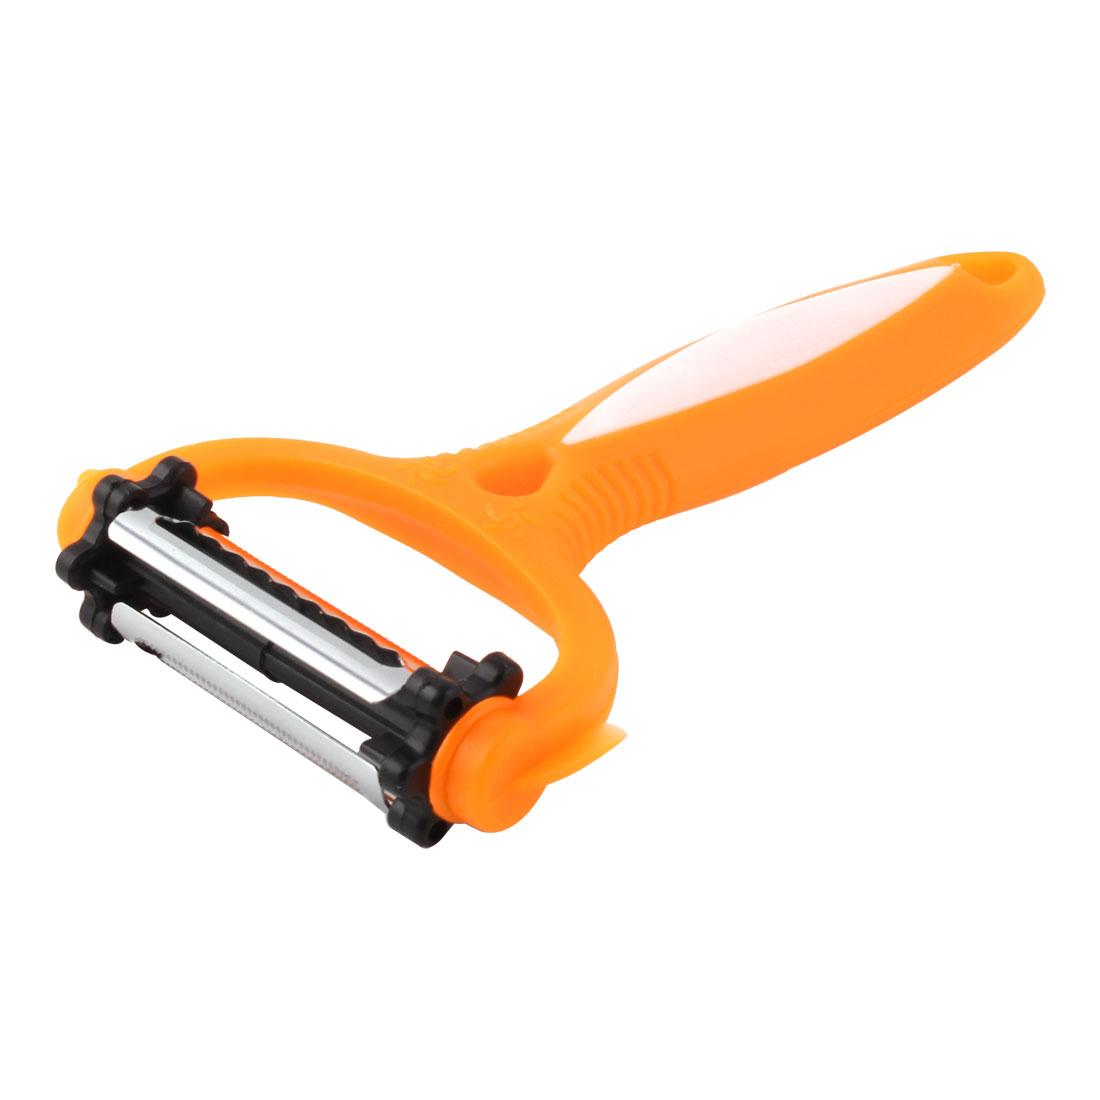 Plastic Handle Stainless Steel Rotatable Blade Fruit Vegetable Slicer Cutter Peeler Orange